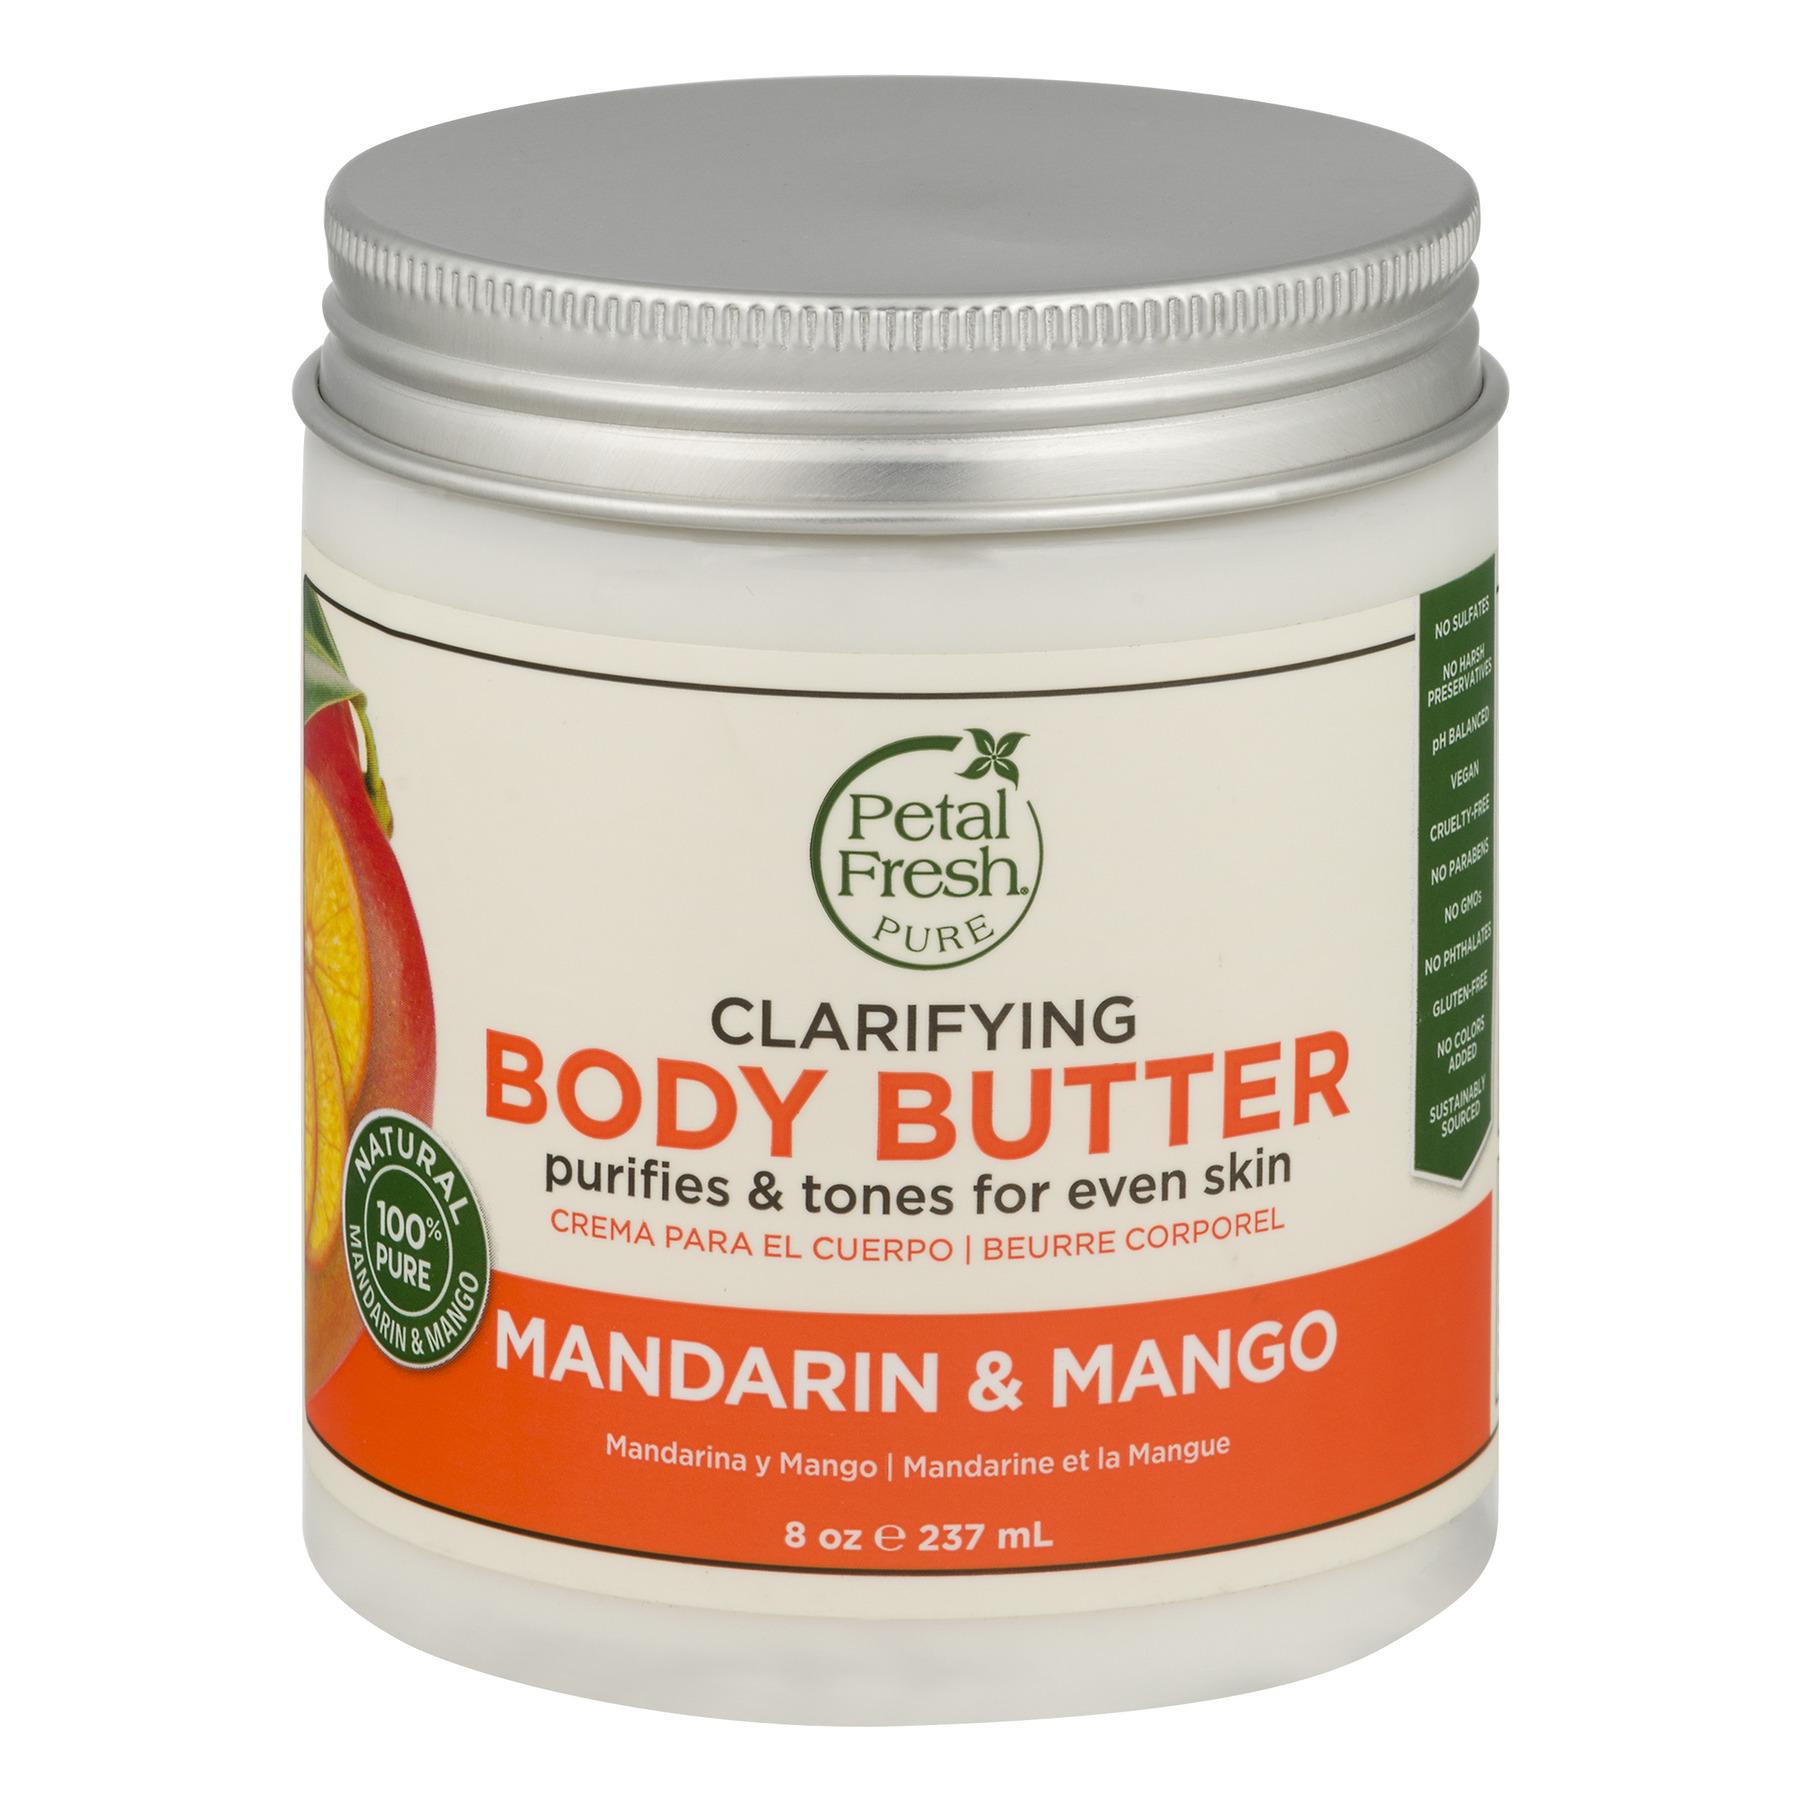 Petal Fresh Clarifying Body Butter Mandarin & Mango, 8.0 OZ